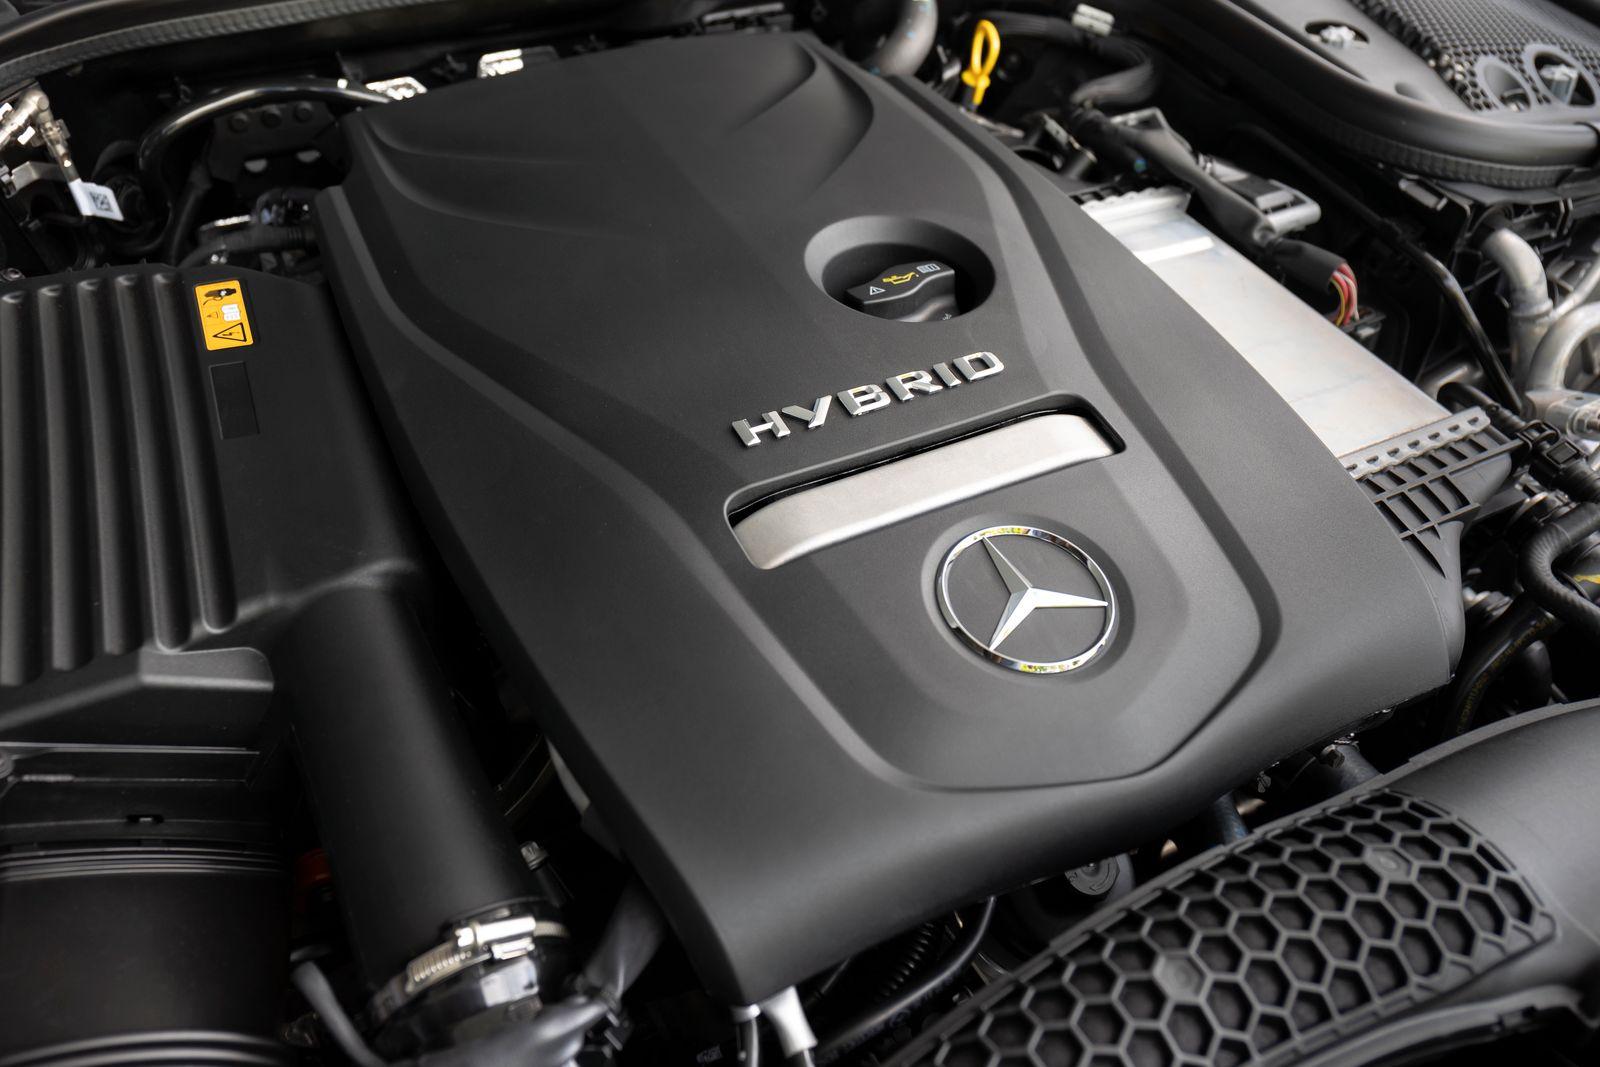 Mercedes-Benz E 300 e 4MATIC Mercedes-Benz E 300 e 4MATIC